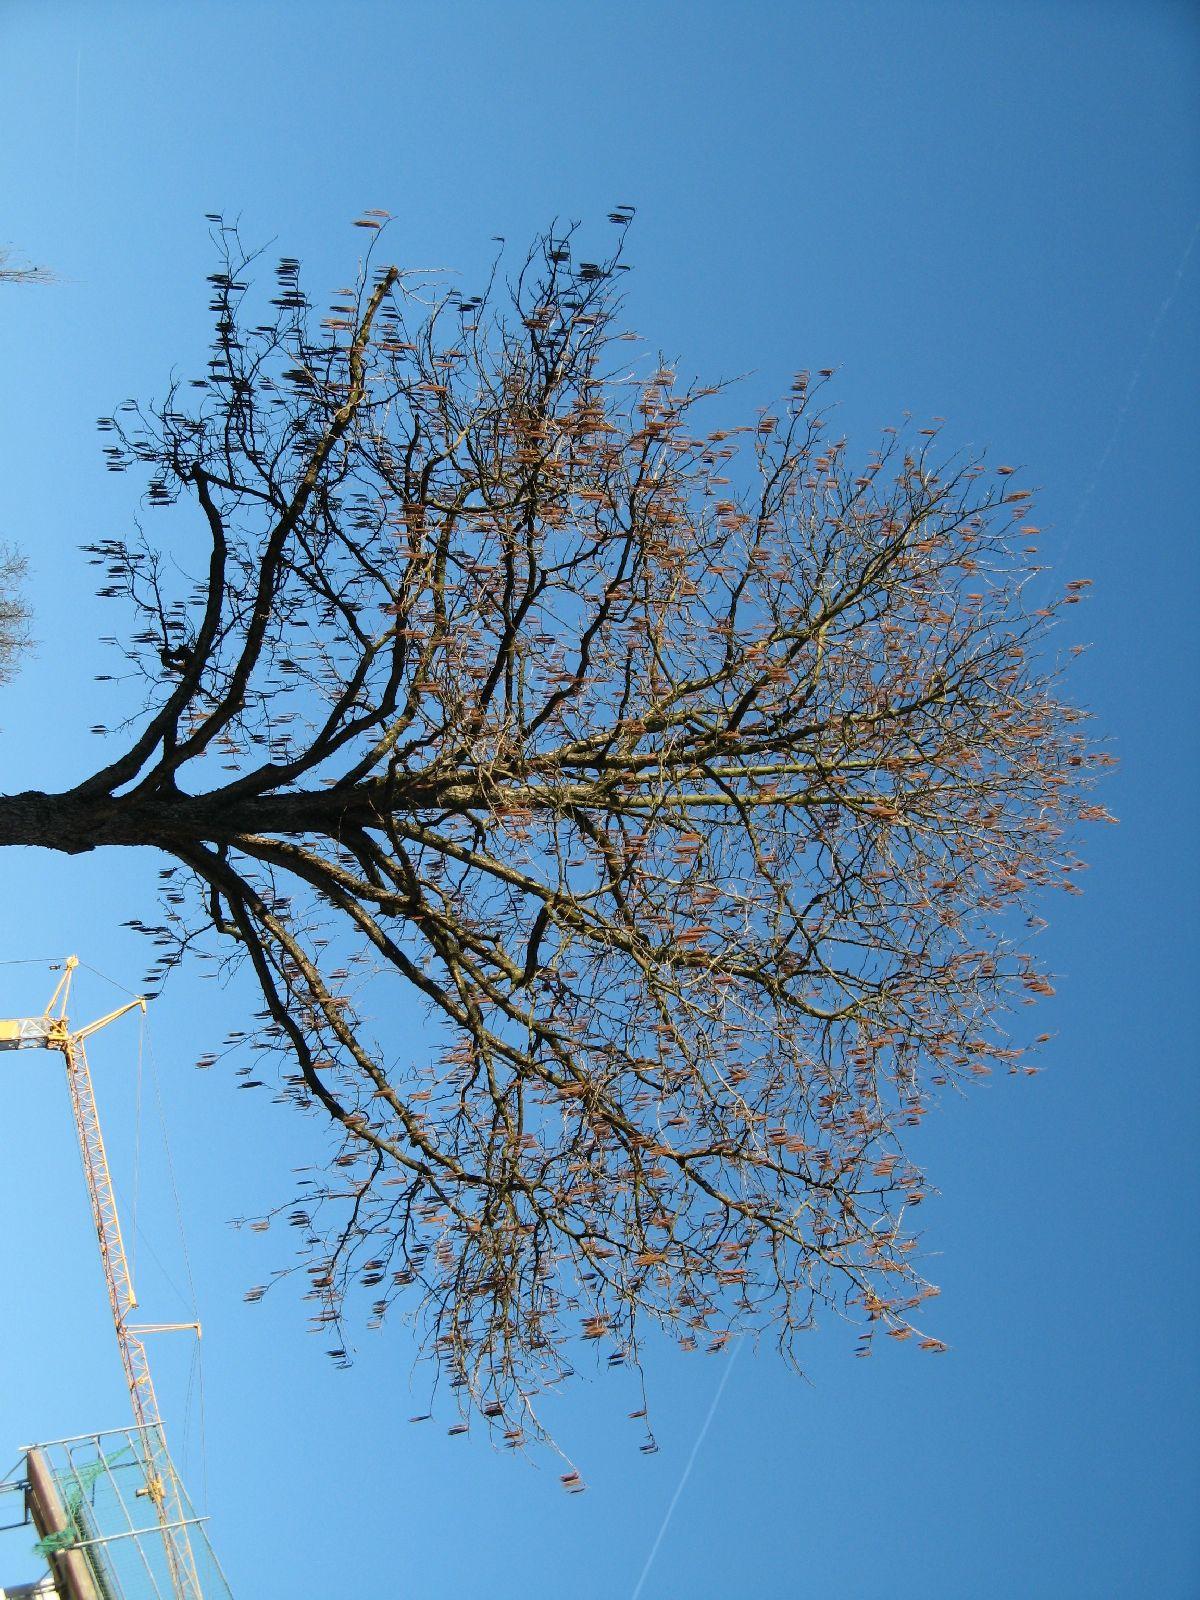 Plants-Trees_Photo_Texture_B_42390